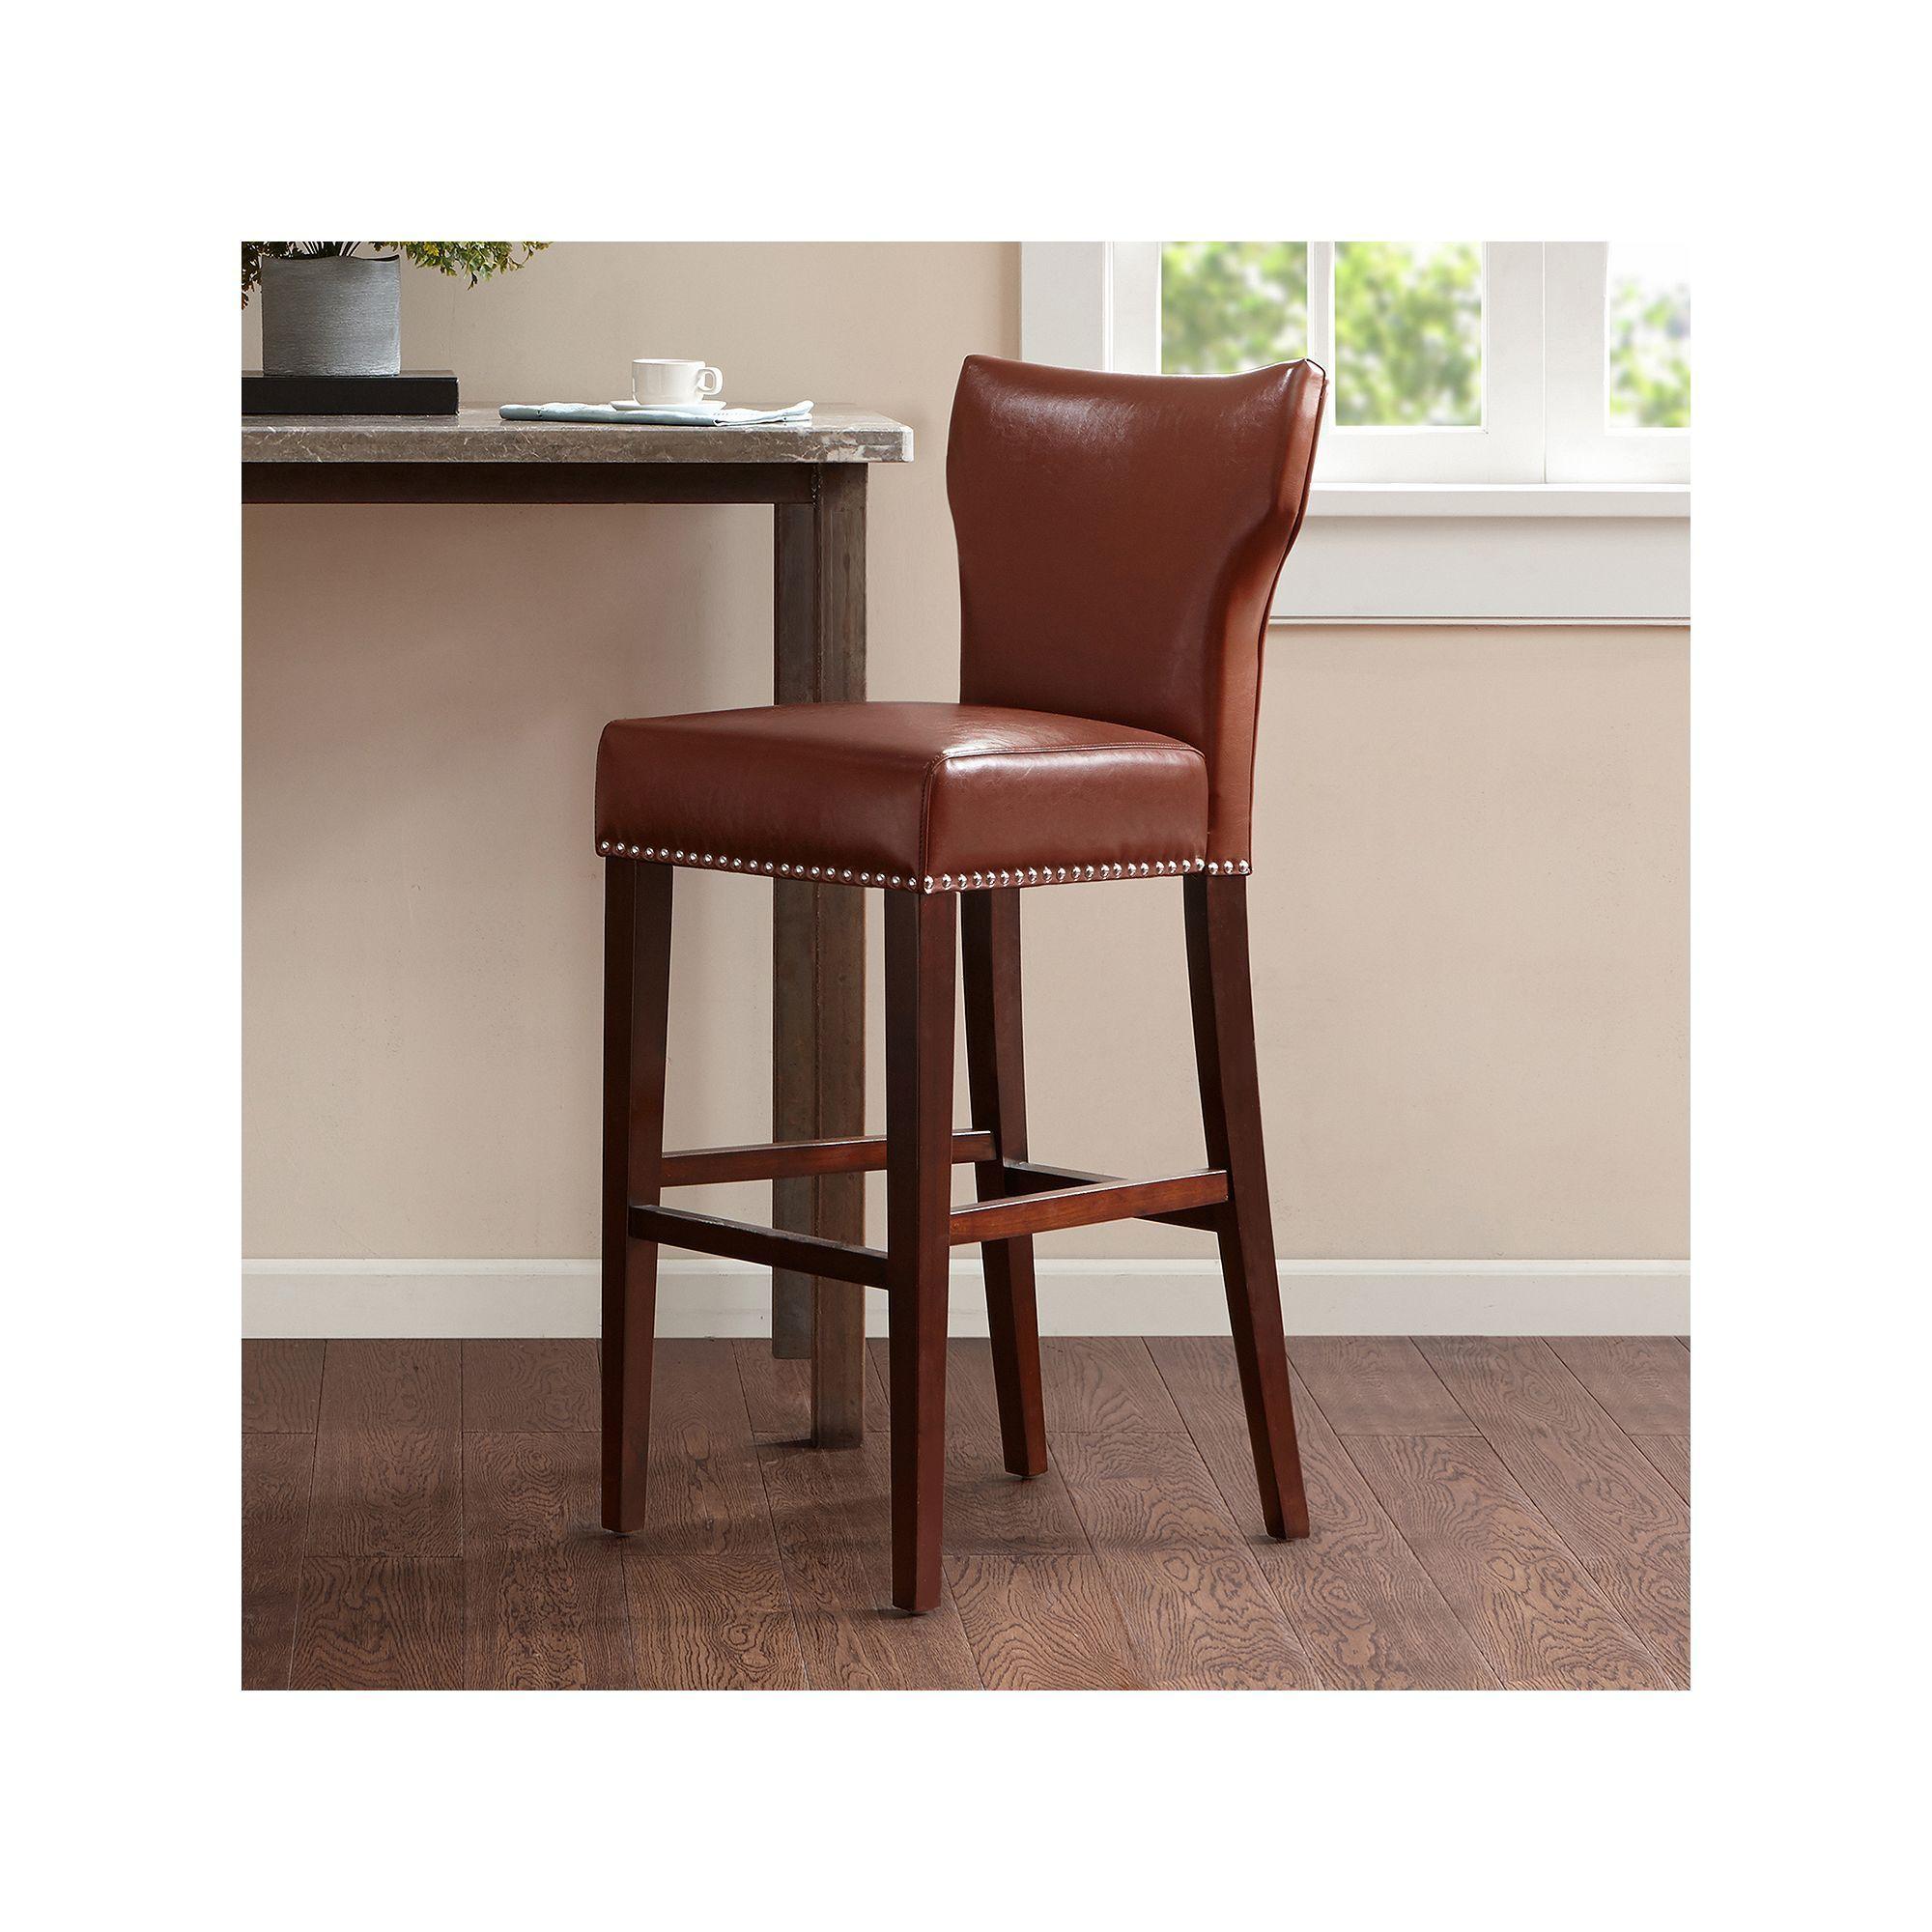 Madison Park Emilia Bar Stool   Bar stools, Stool, Dining room ...